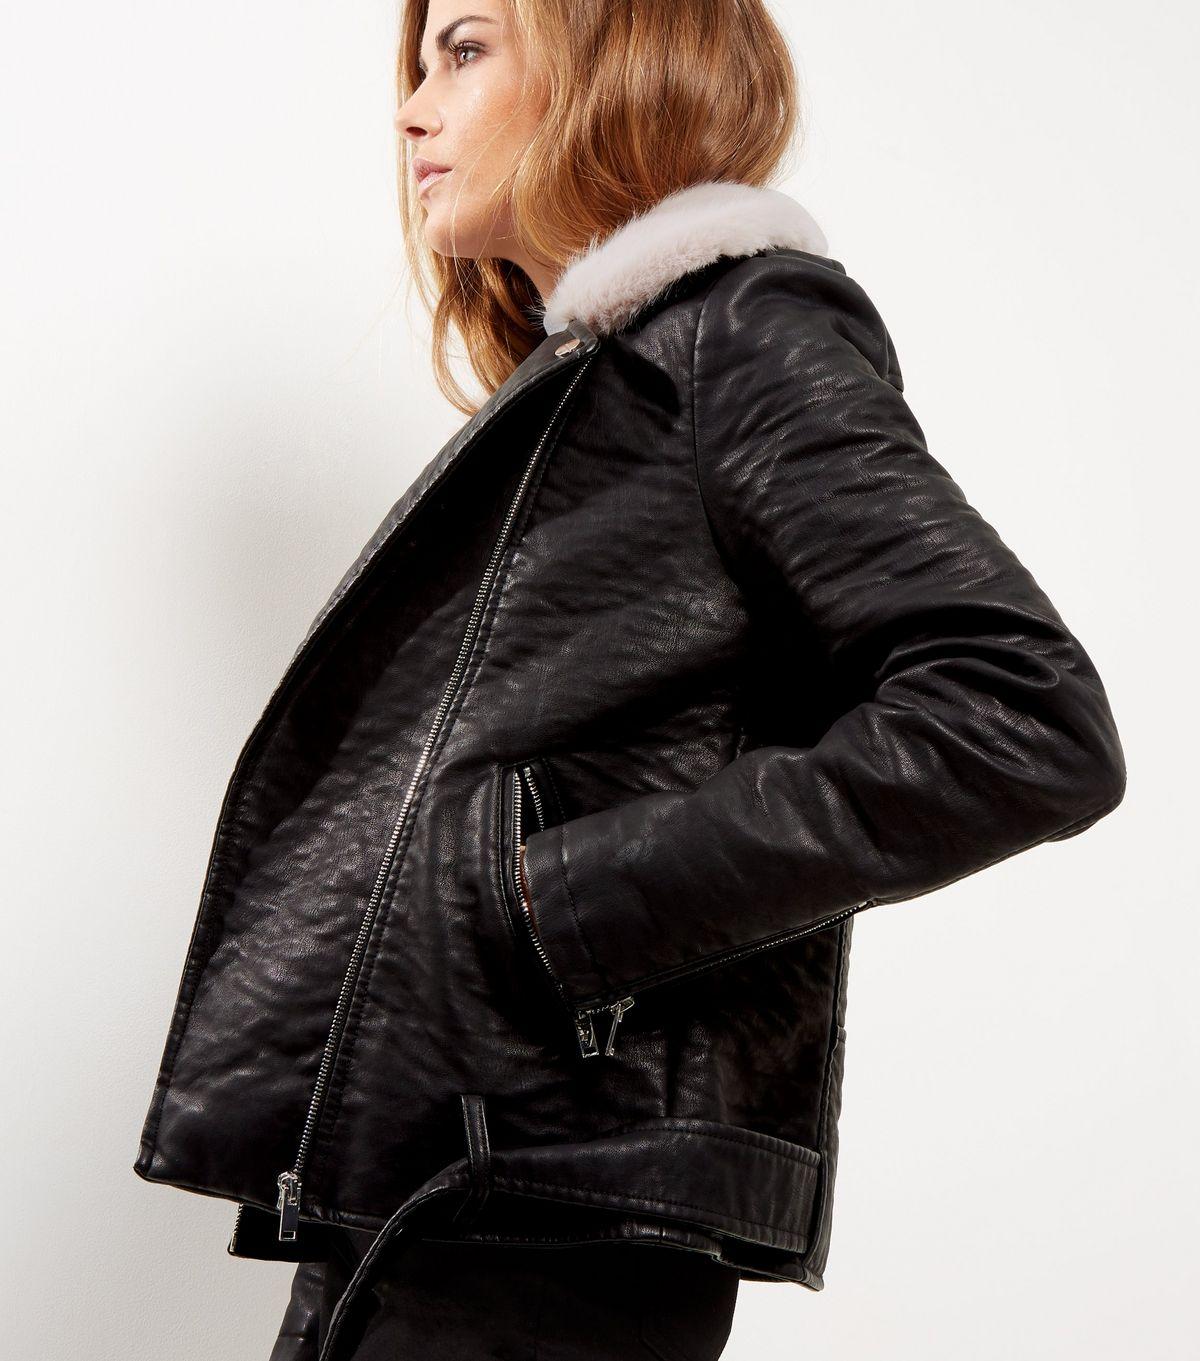 Ladies Leather Bomber Jacket